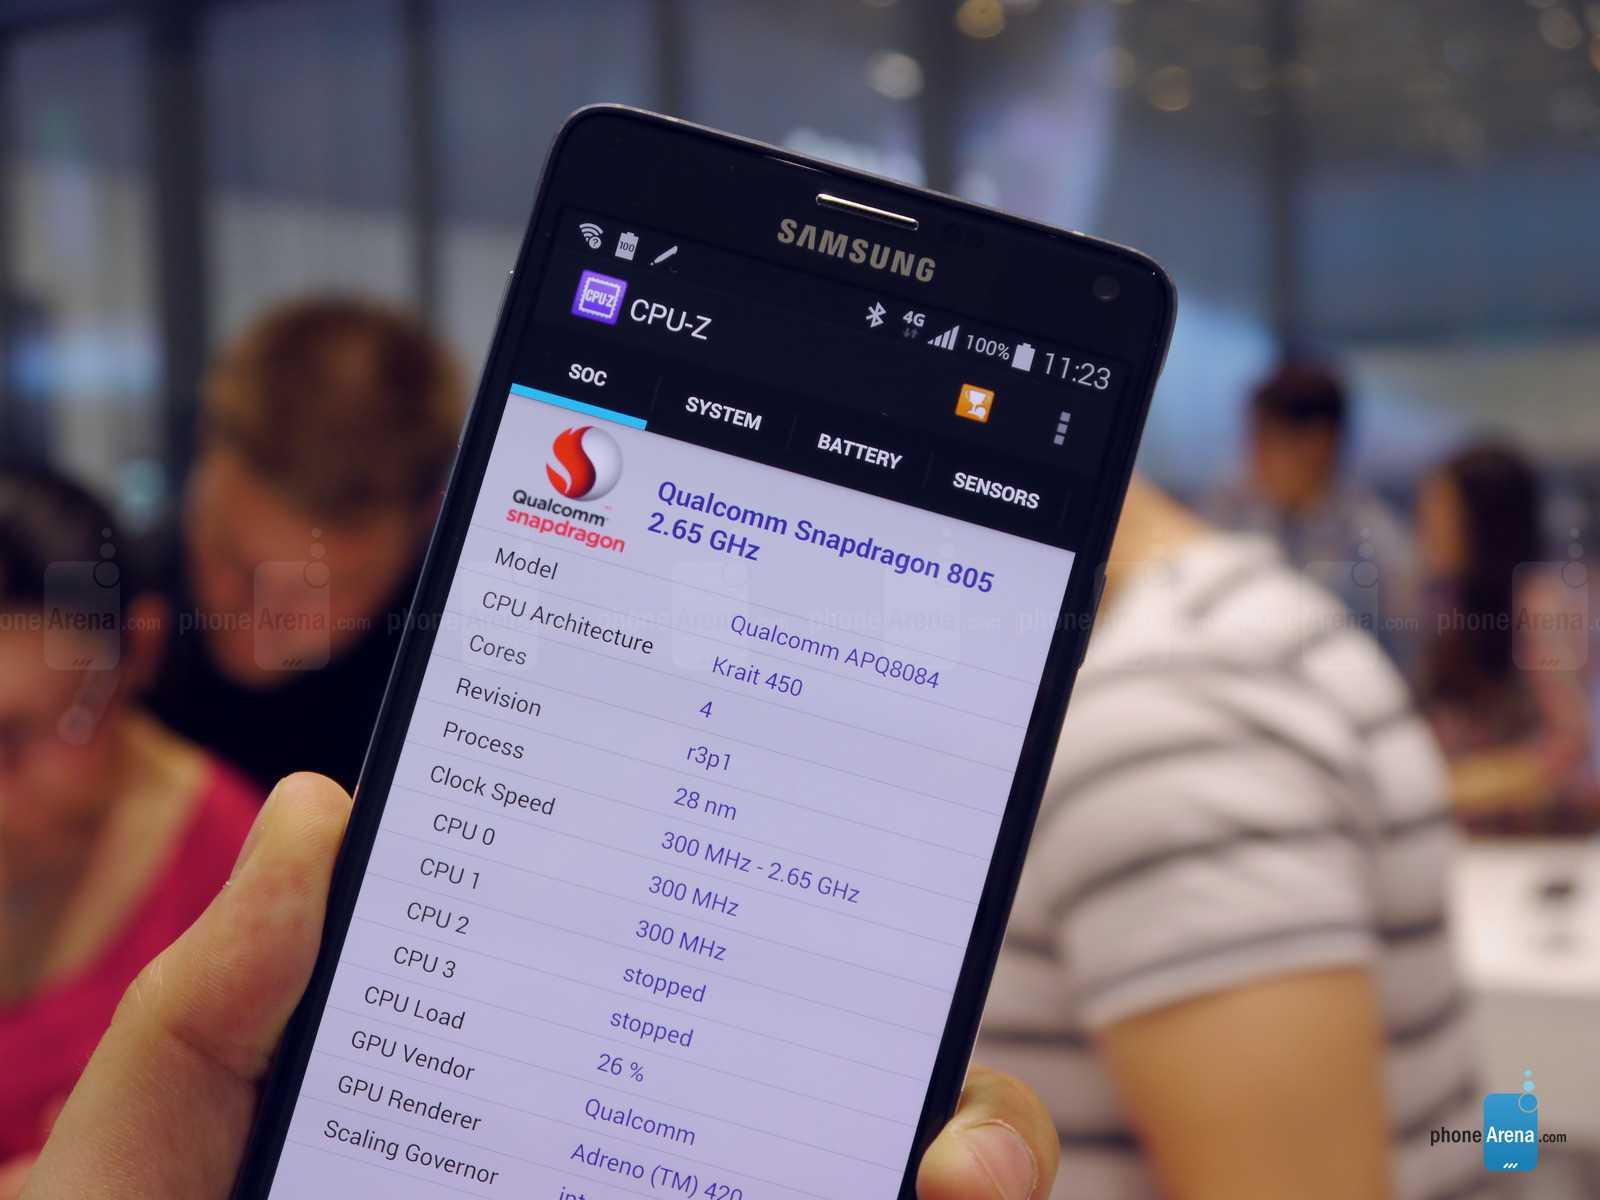 Crazy-fast-Snapdragon-805-SoC